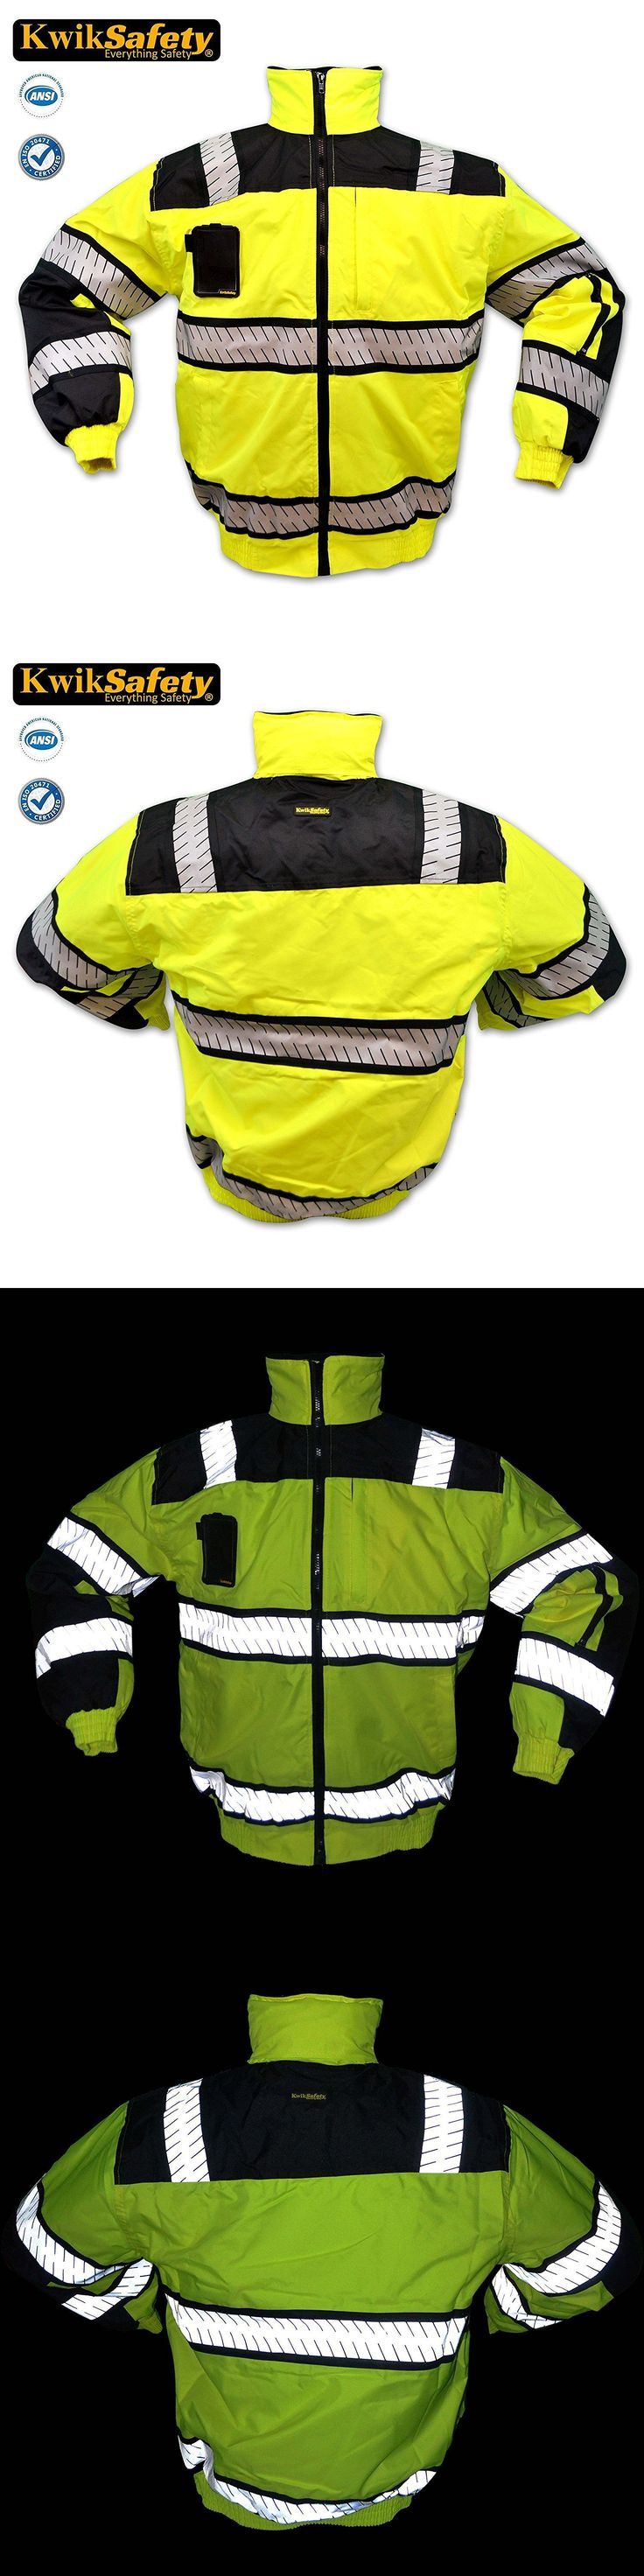 Jackets and Vests 175629: Hi Vis Ansi C 3 Reflective Bomber Safety Jacket Fishbone Waterproof Weatherproof -> BUY IT NOW ONLY: $55.99 on eBay!